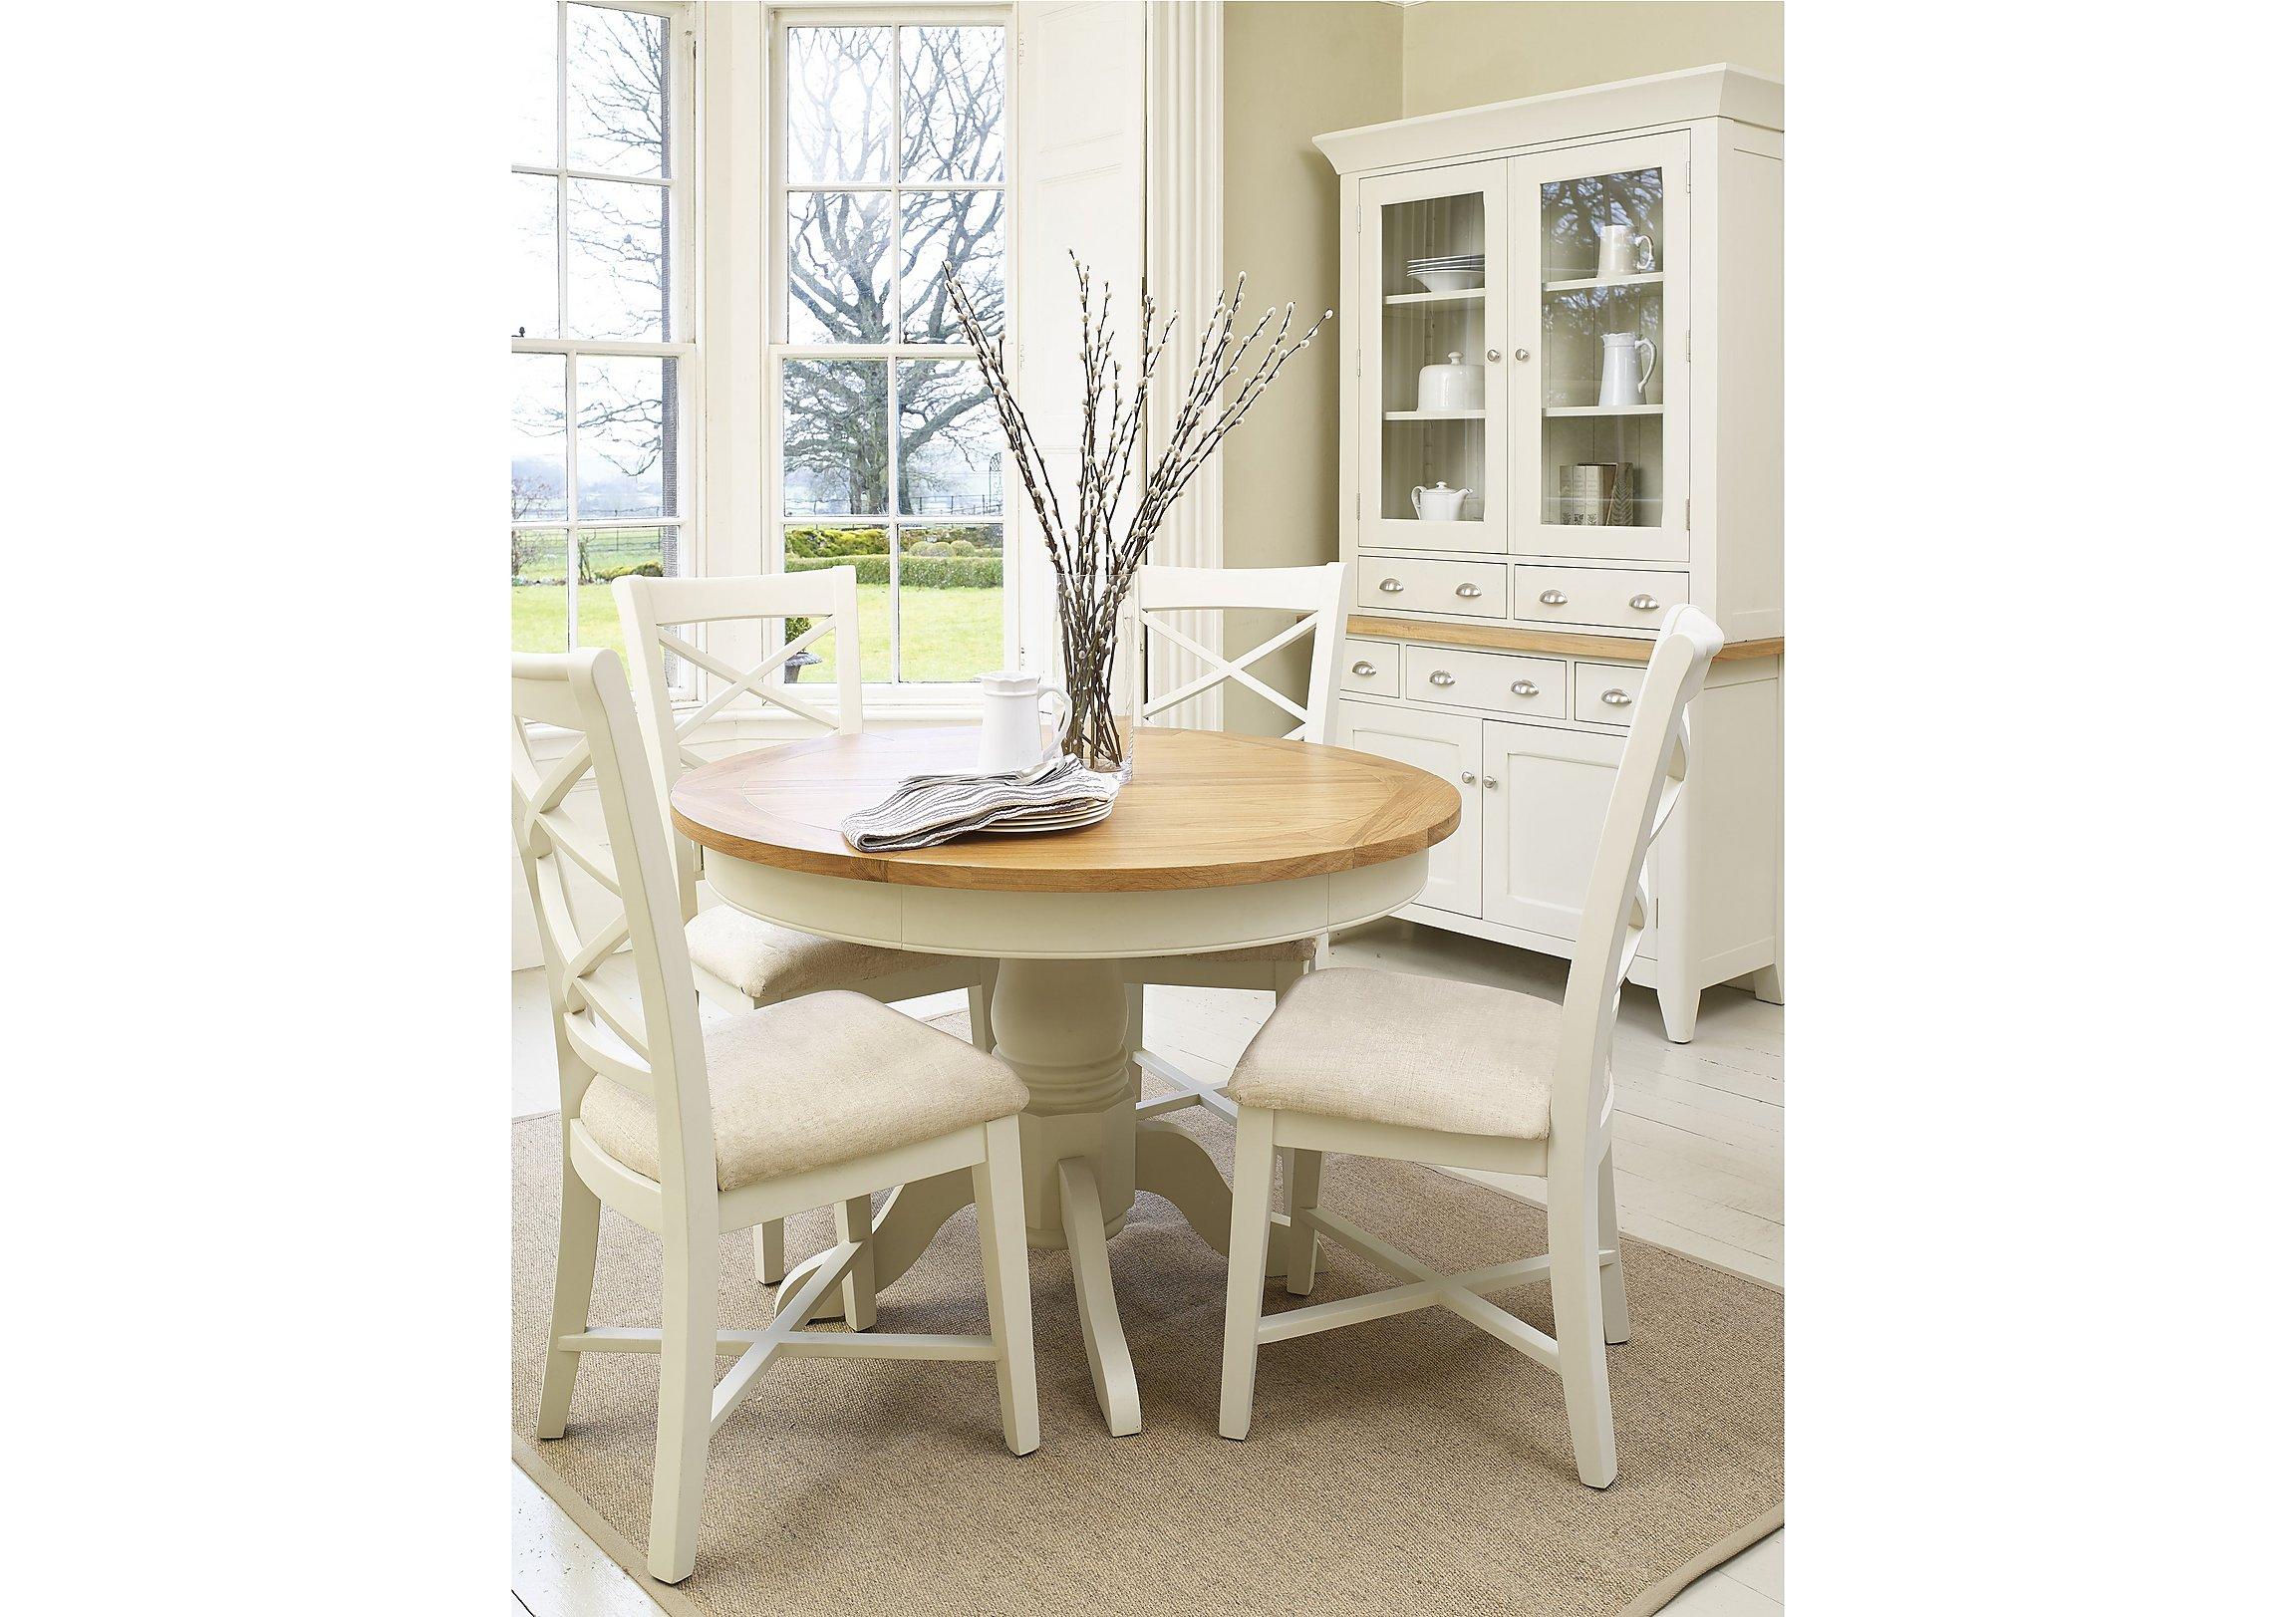 https://i1.adis.ws/i/fv/PRODARLSRDTBDHD-001_arles_round-extending-dining-table__lifestyle?$zoom$&h=1623&w=2304